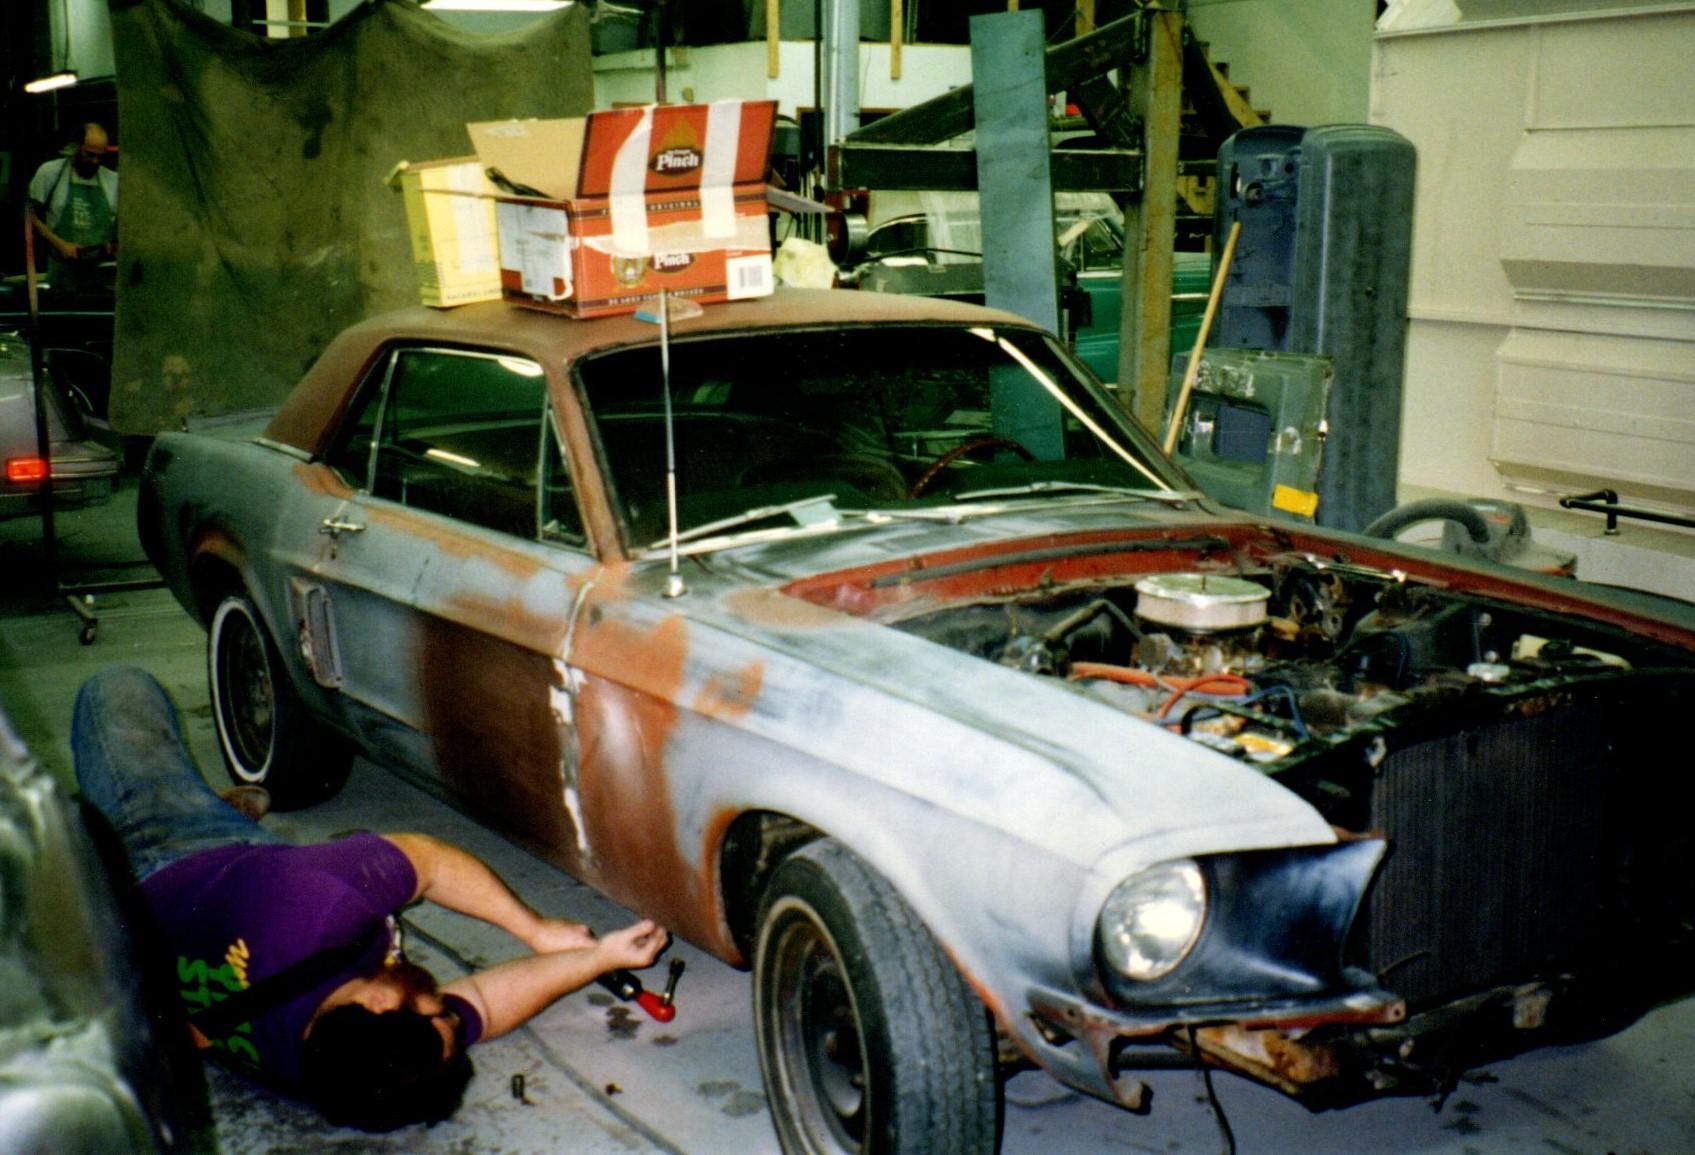 1968 Mustang